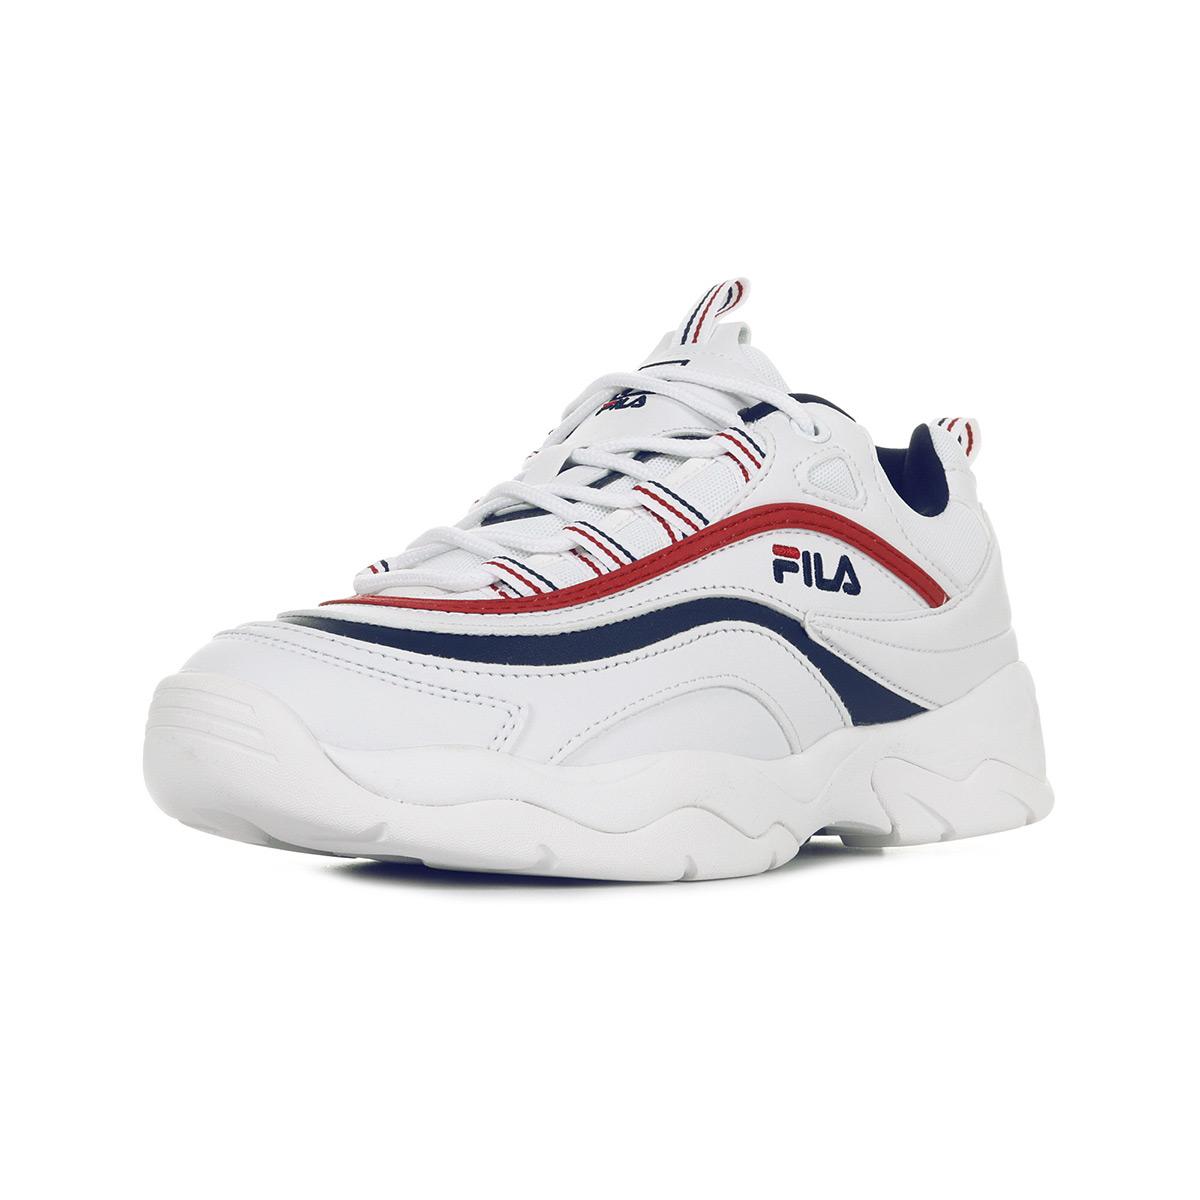 Détails sur Chaussures Baskets Fila homme Ray Low taille Blanc Blanche Cuir Lacets